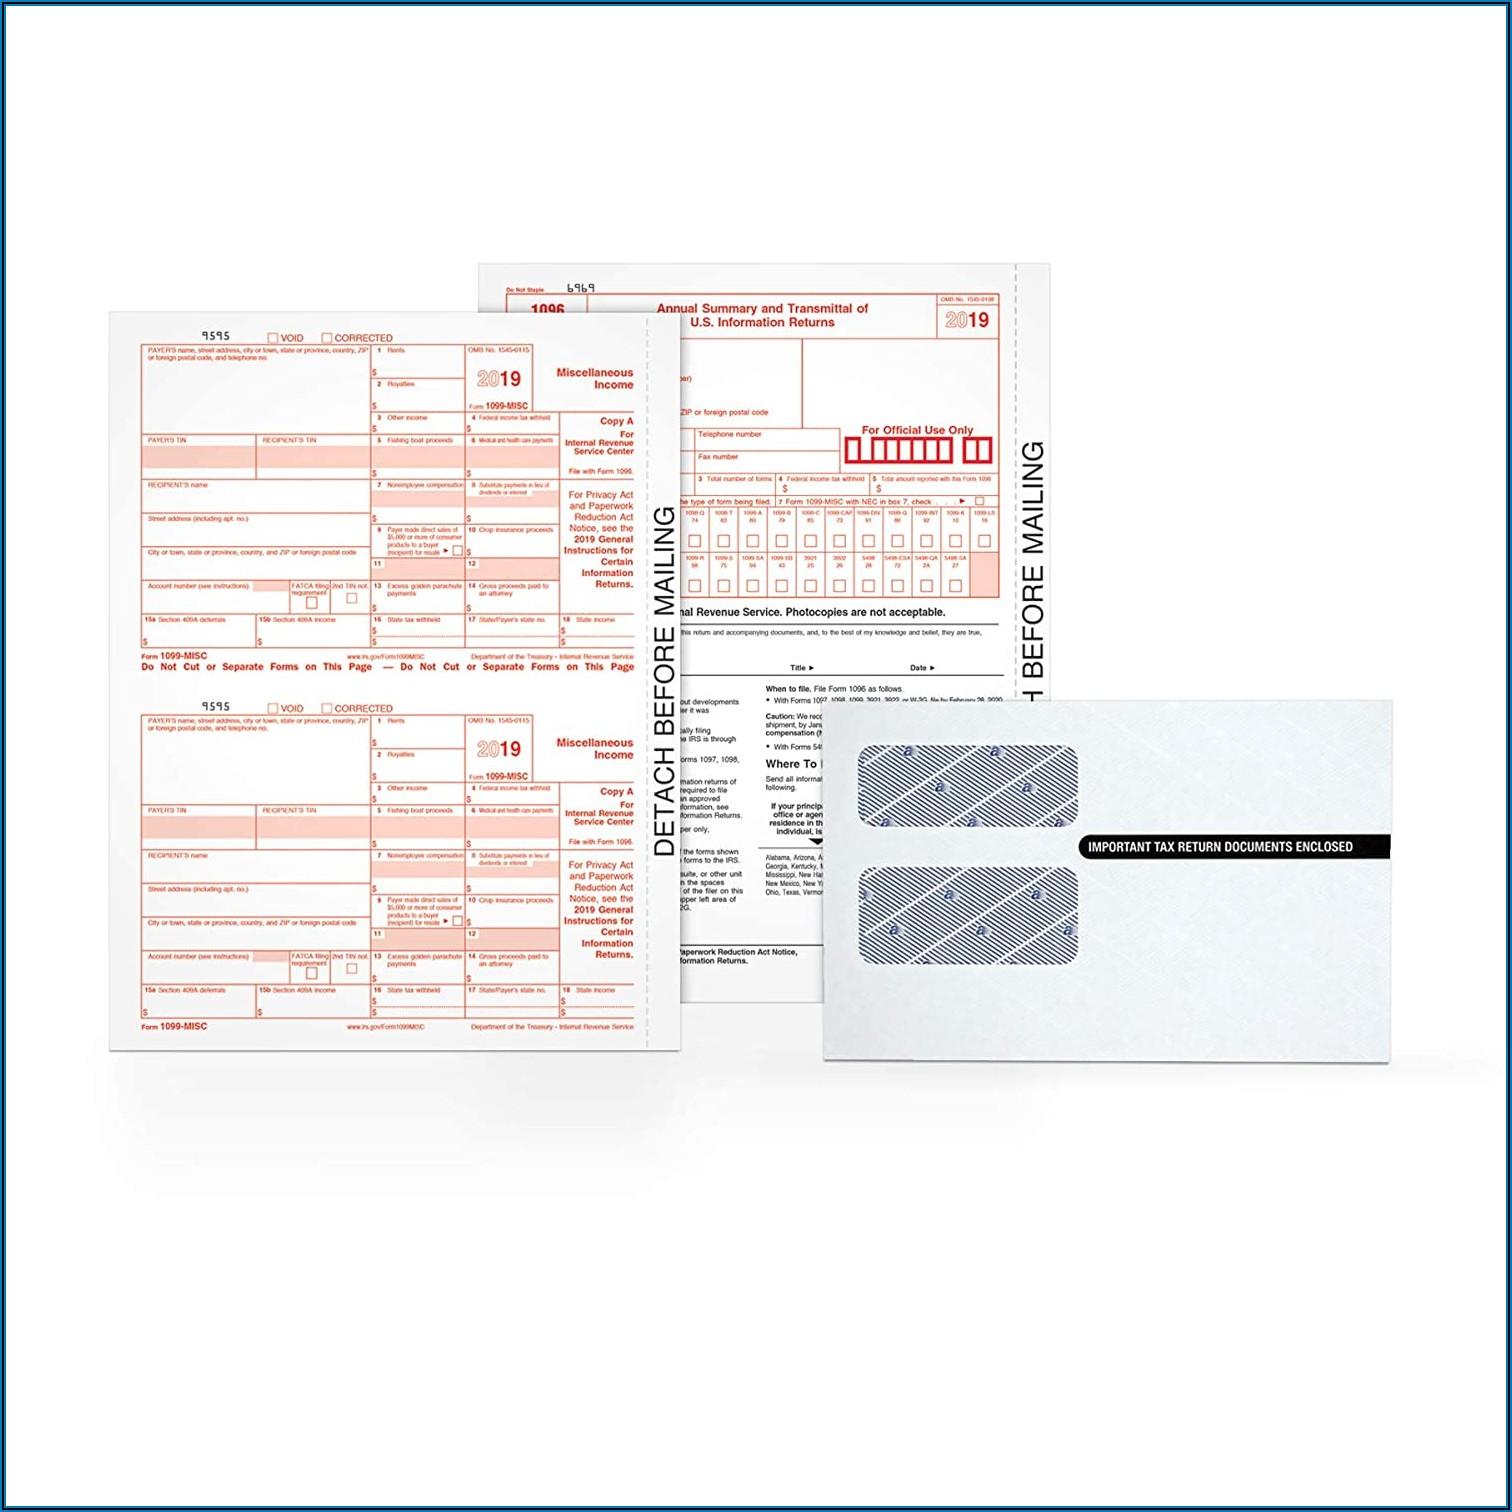 1099 Misc Inkjetlaser Tax Forms